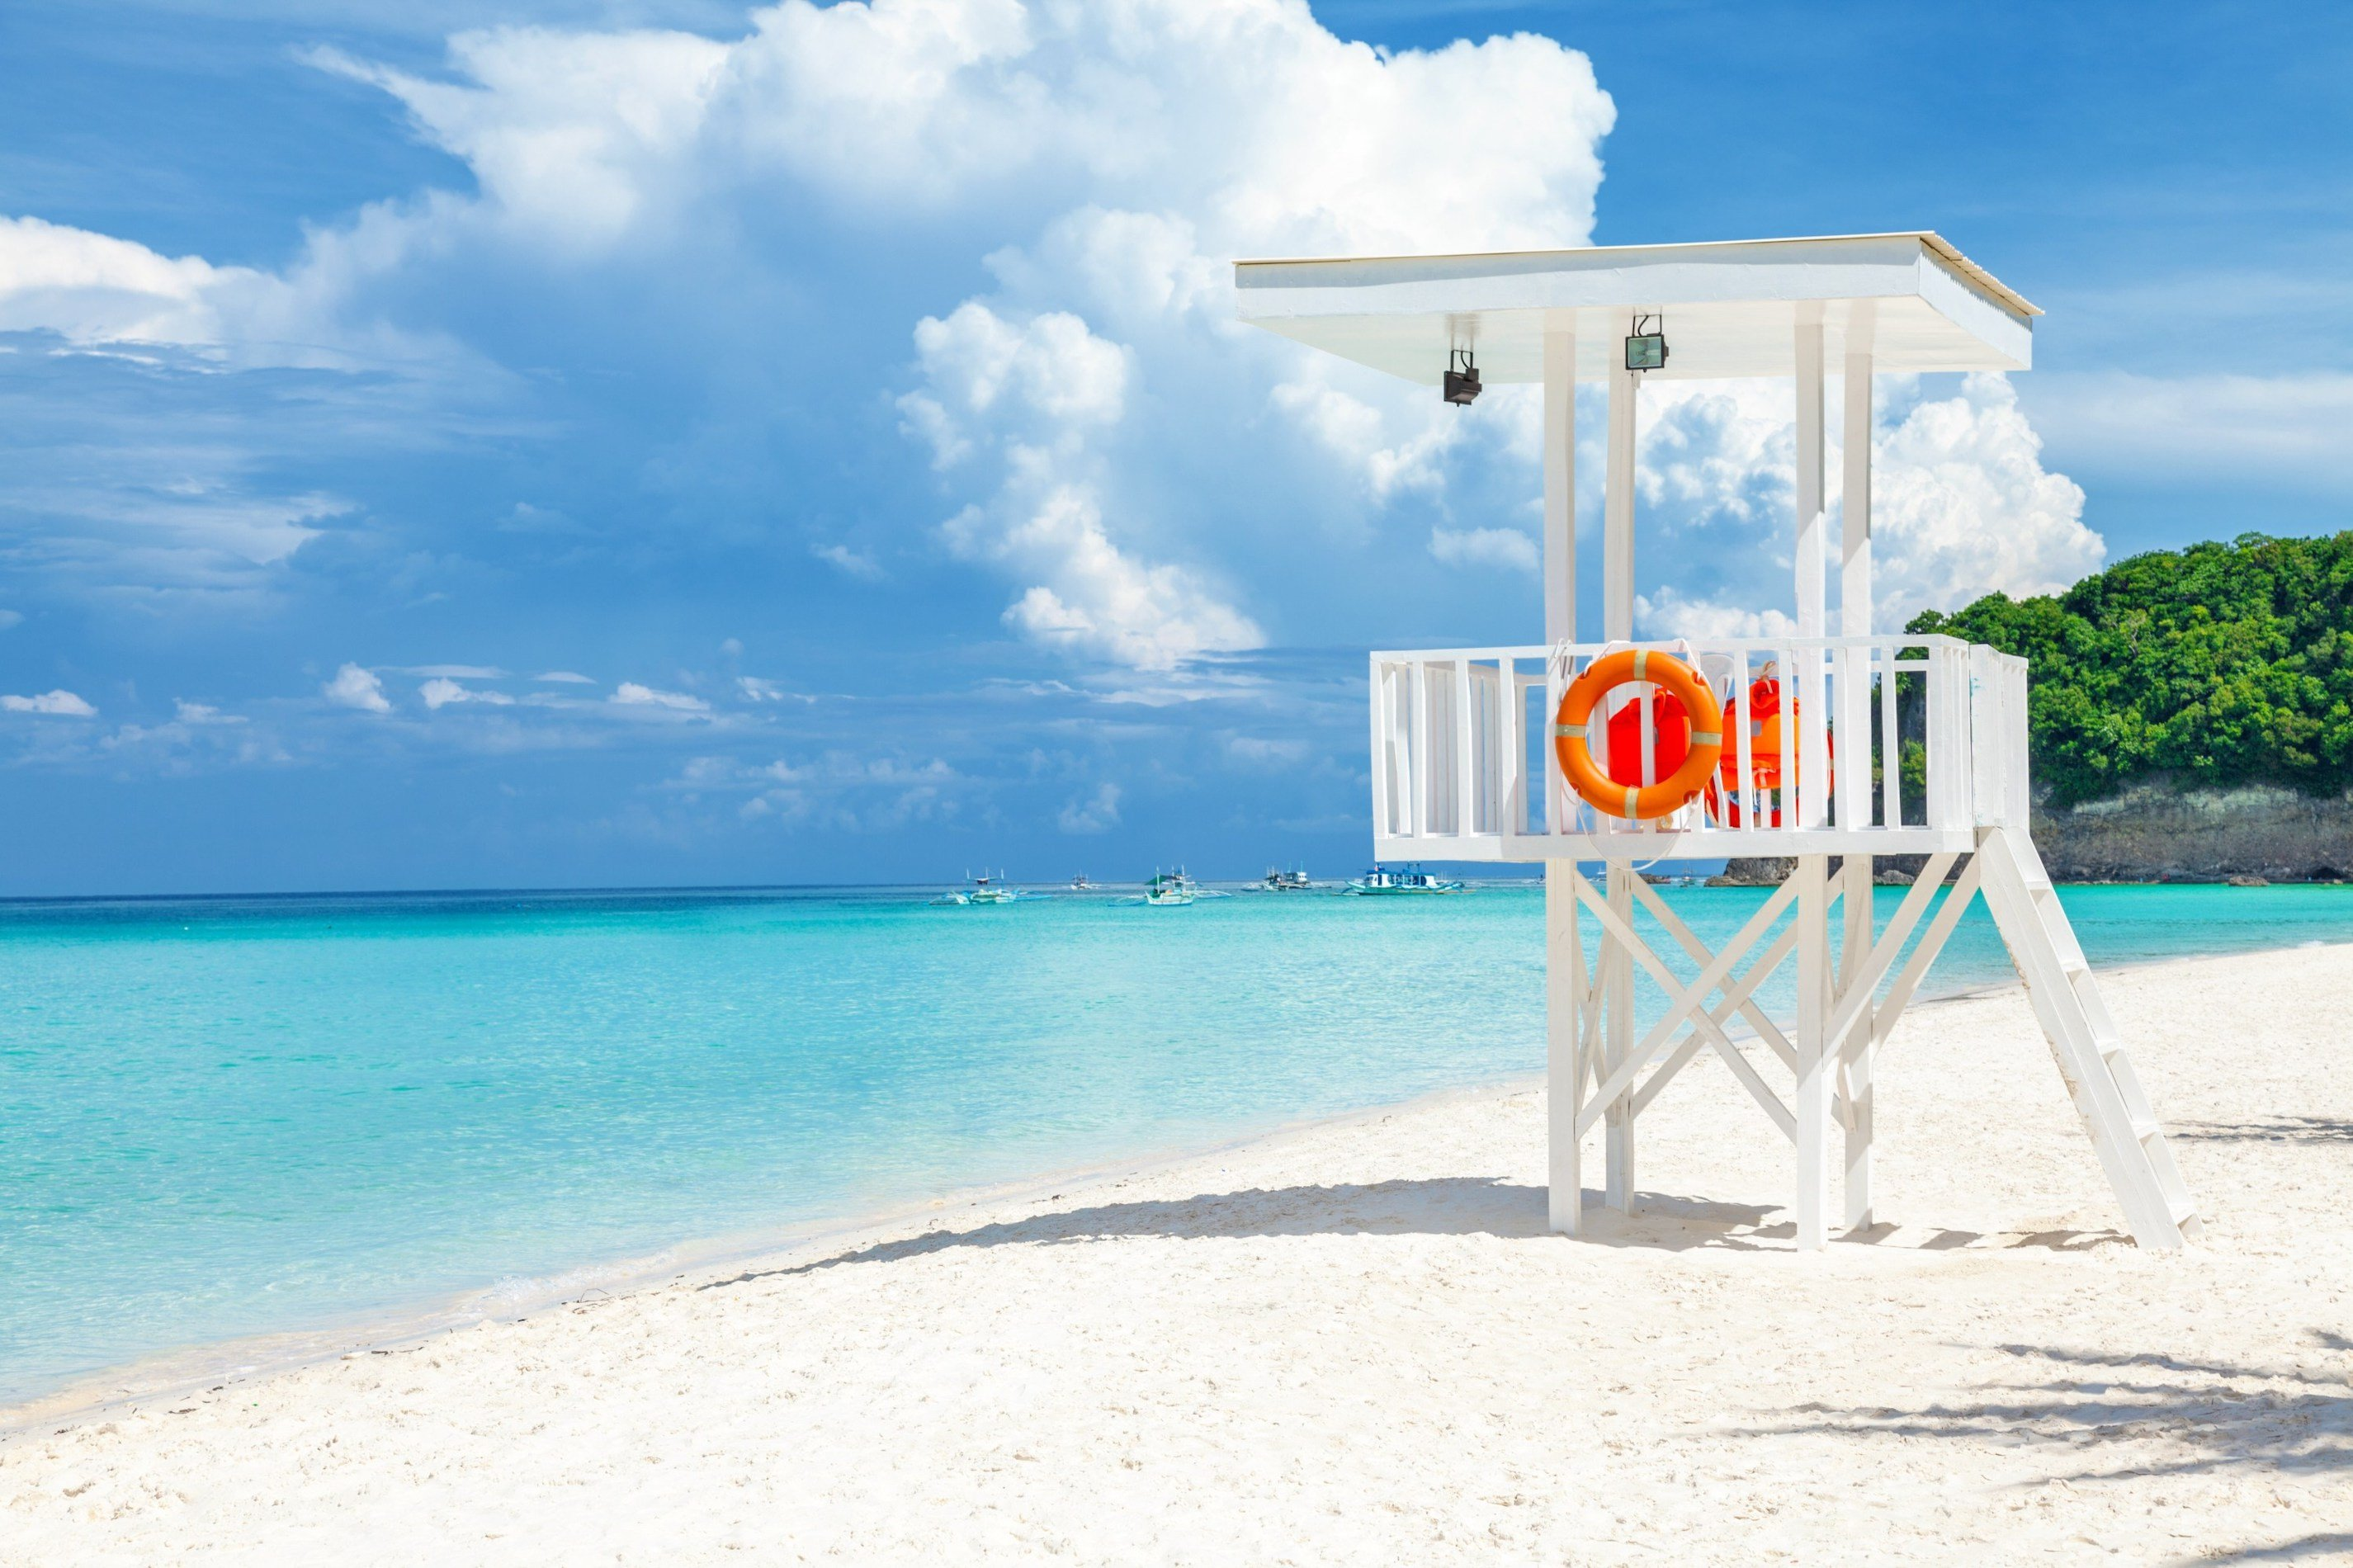 Sabbia bianca e mare turchese a Boracay